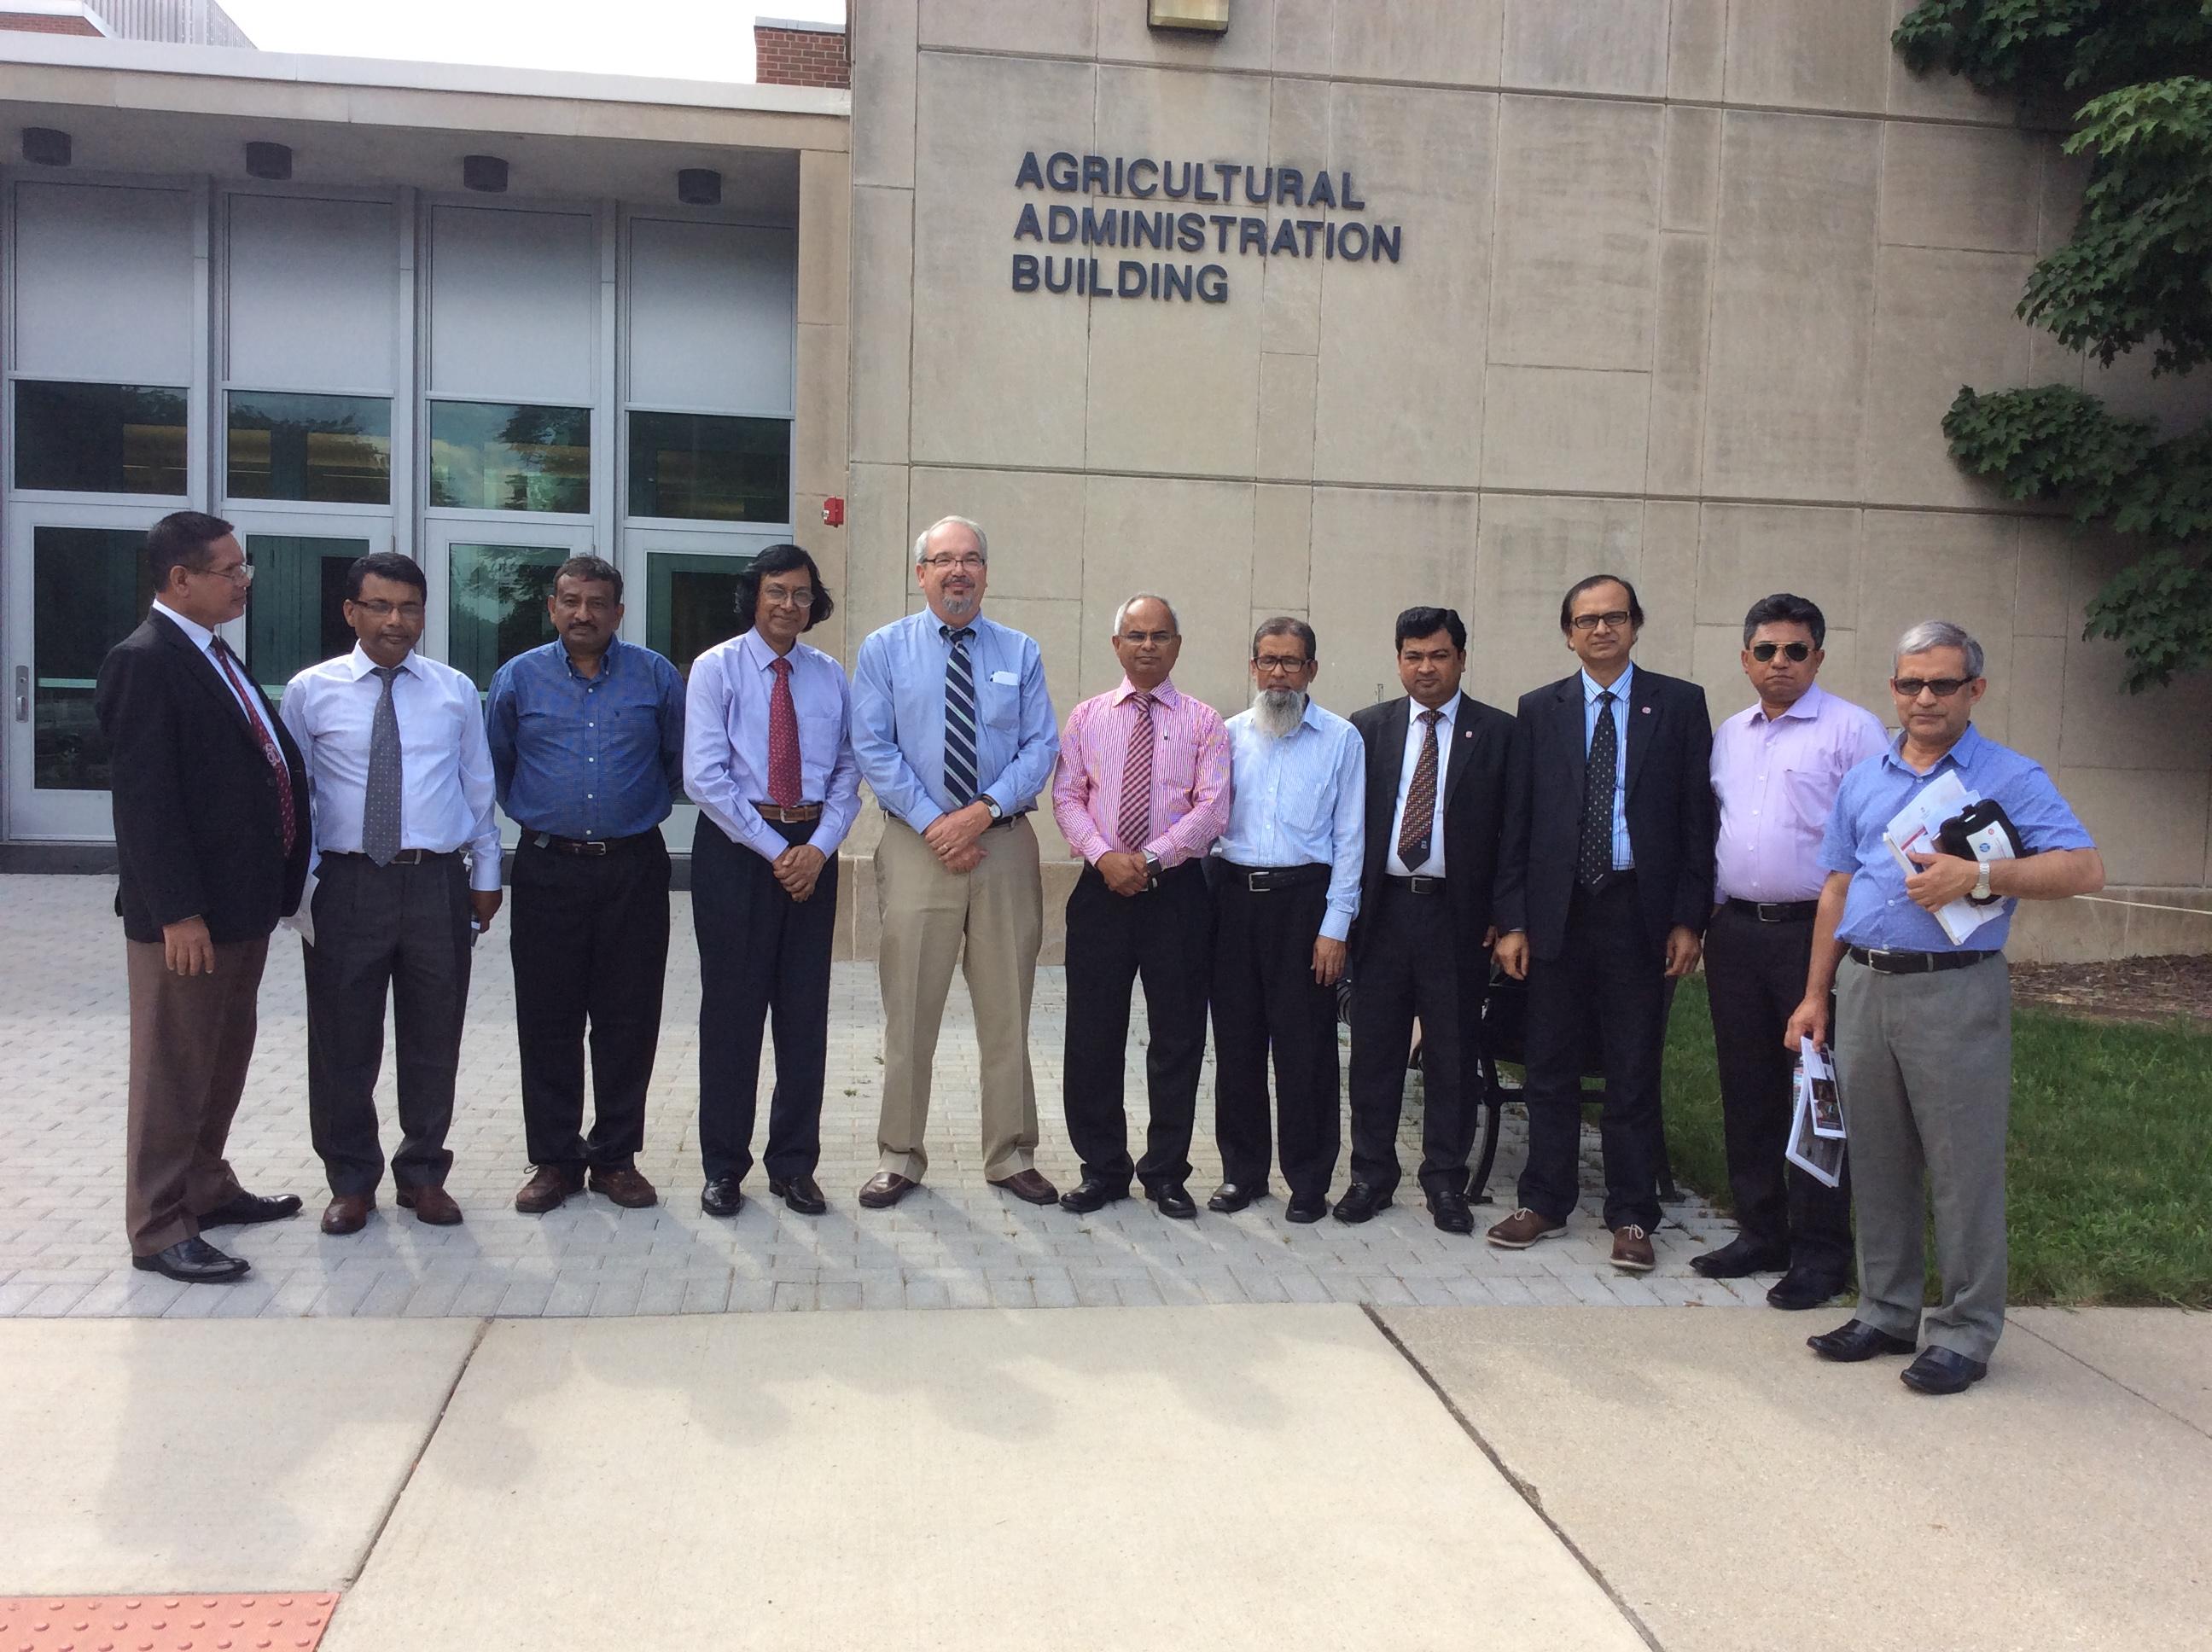 Bangladesh Delegates Visit Ohio State University